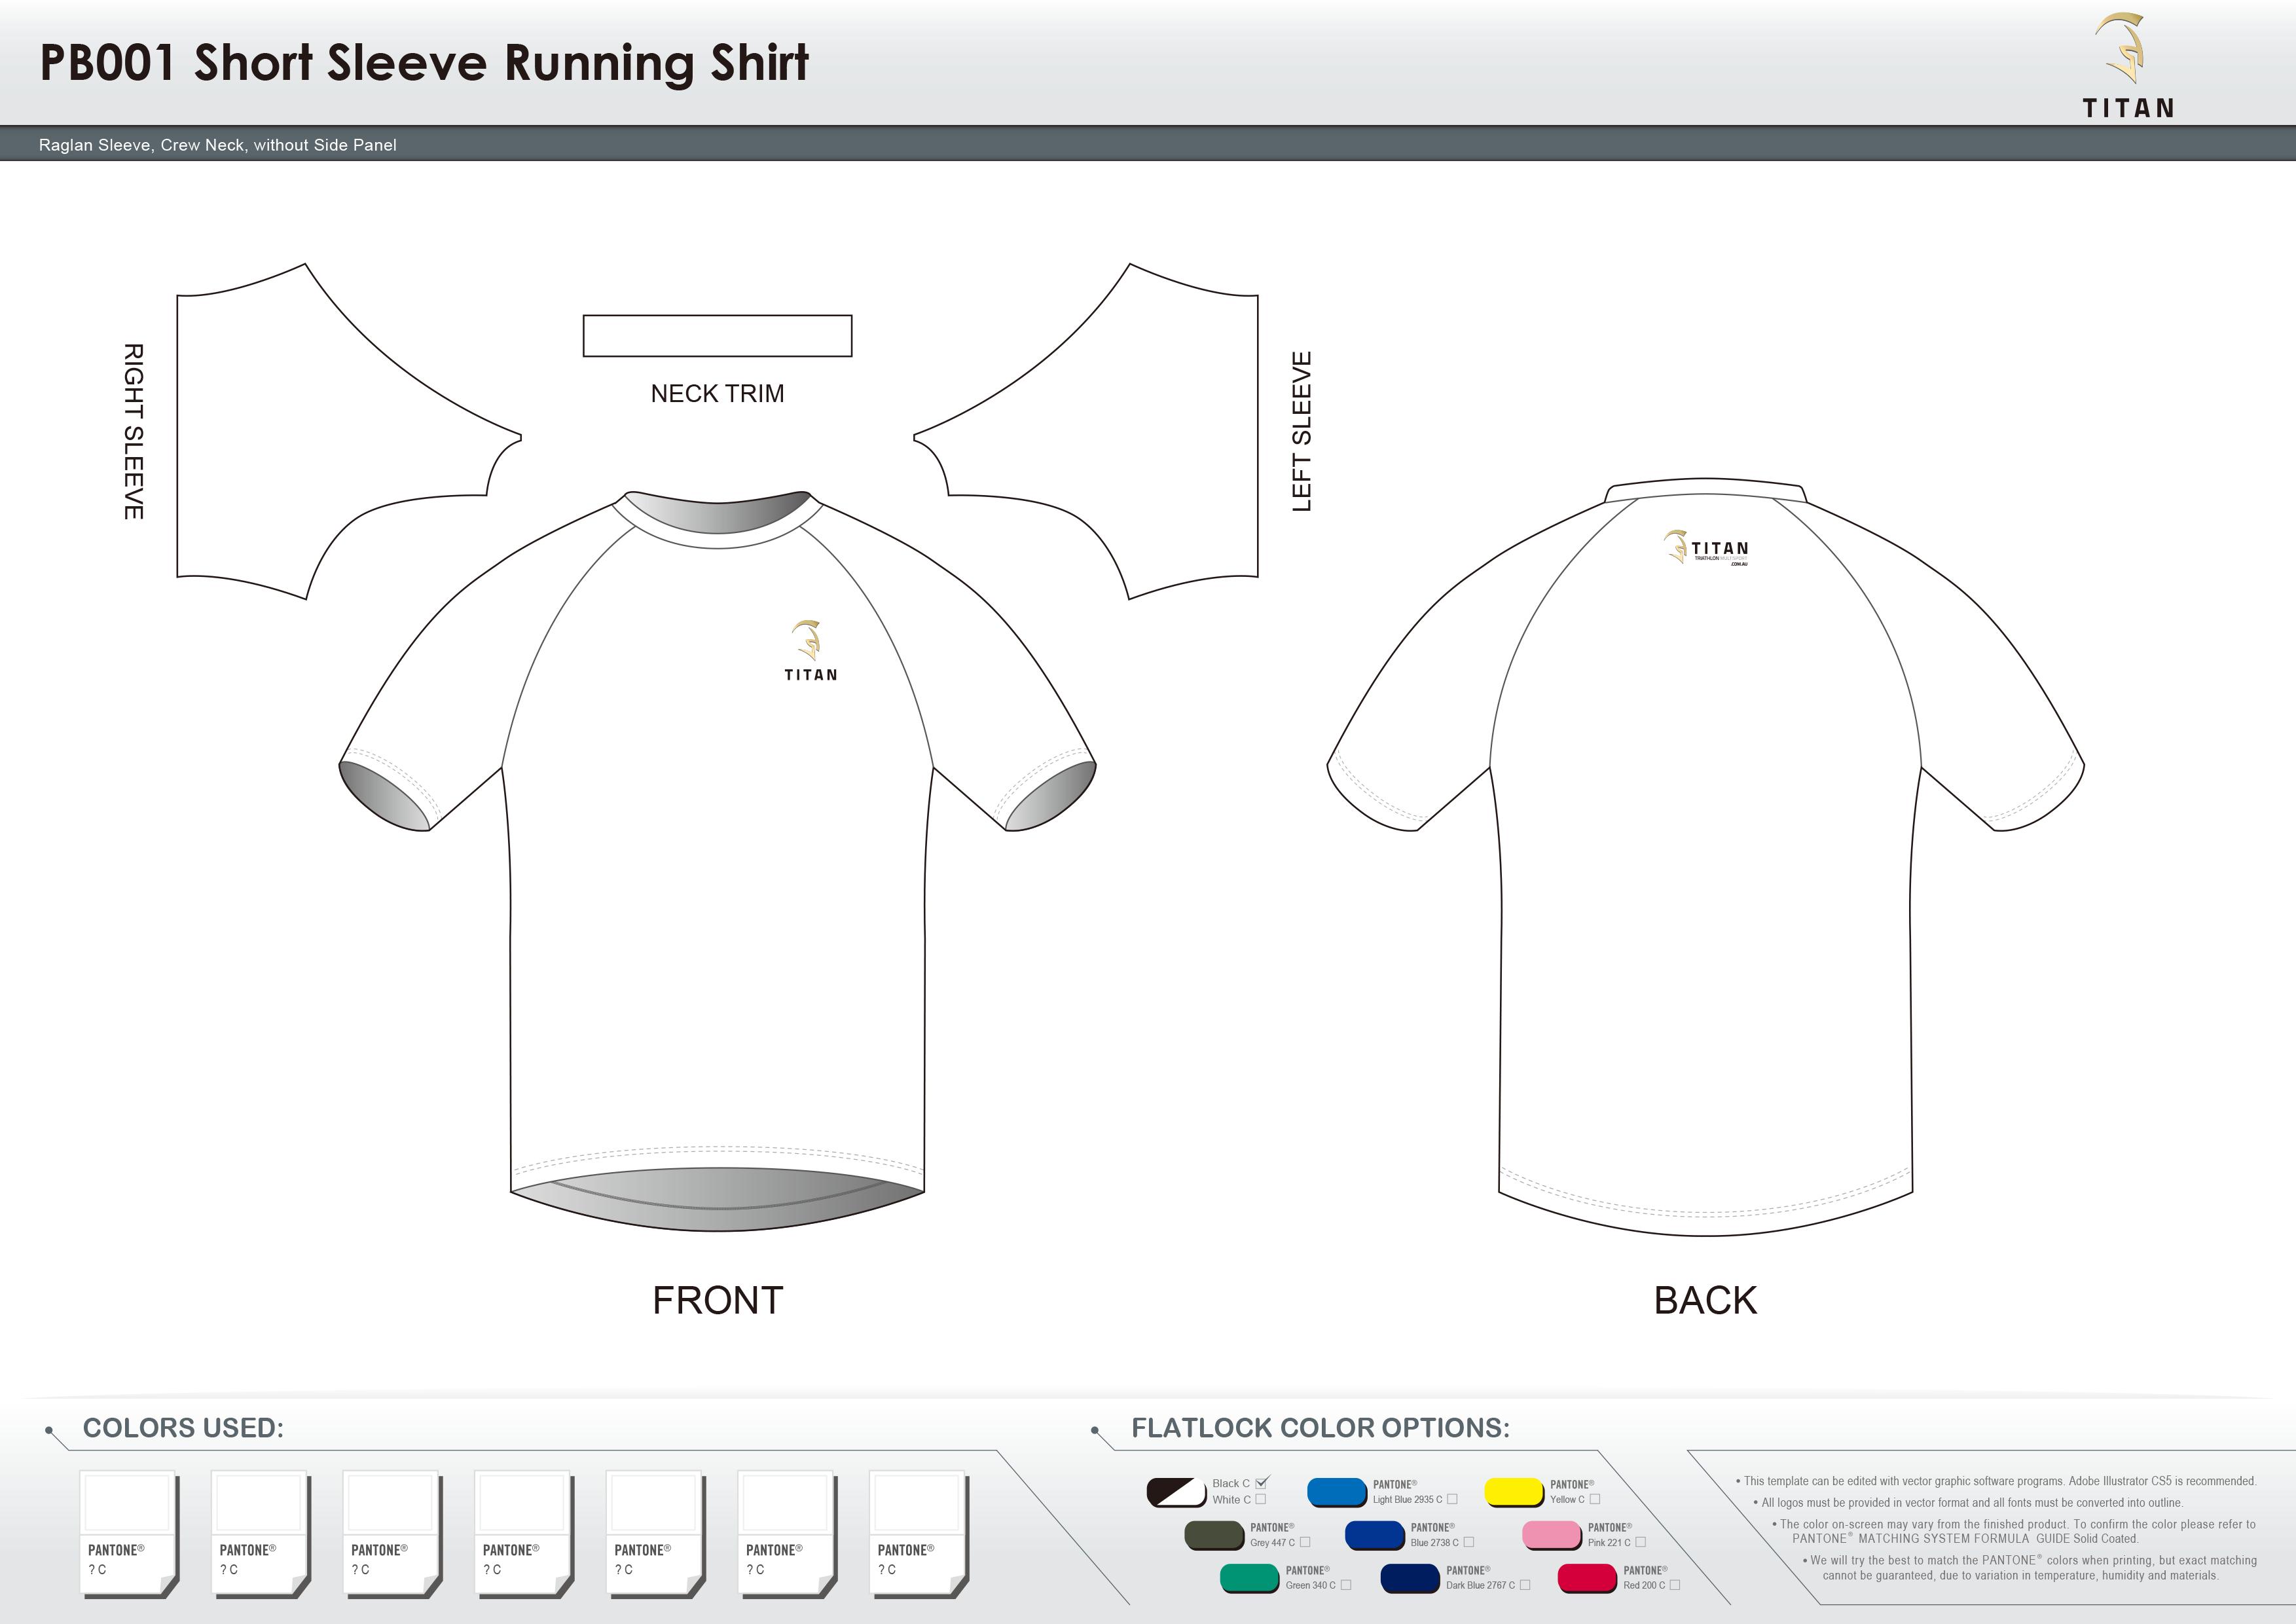 PB001 Short Sleeve Running Shirt